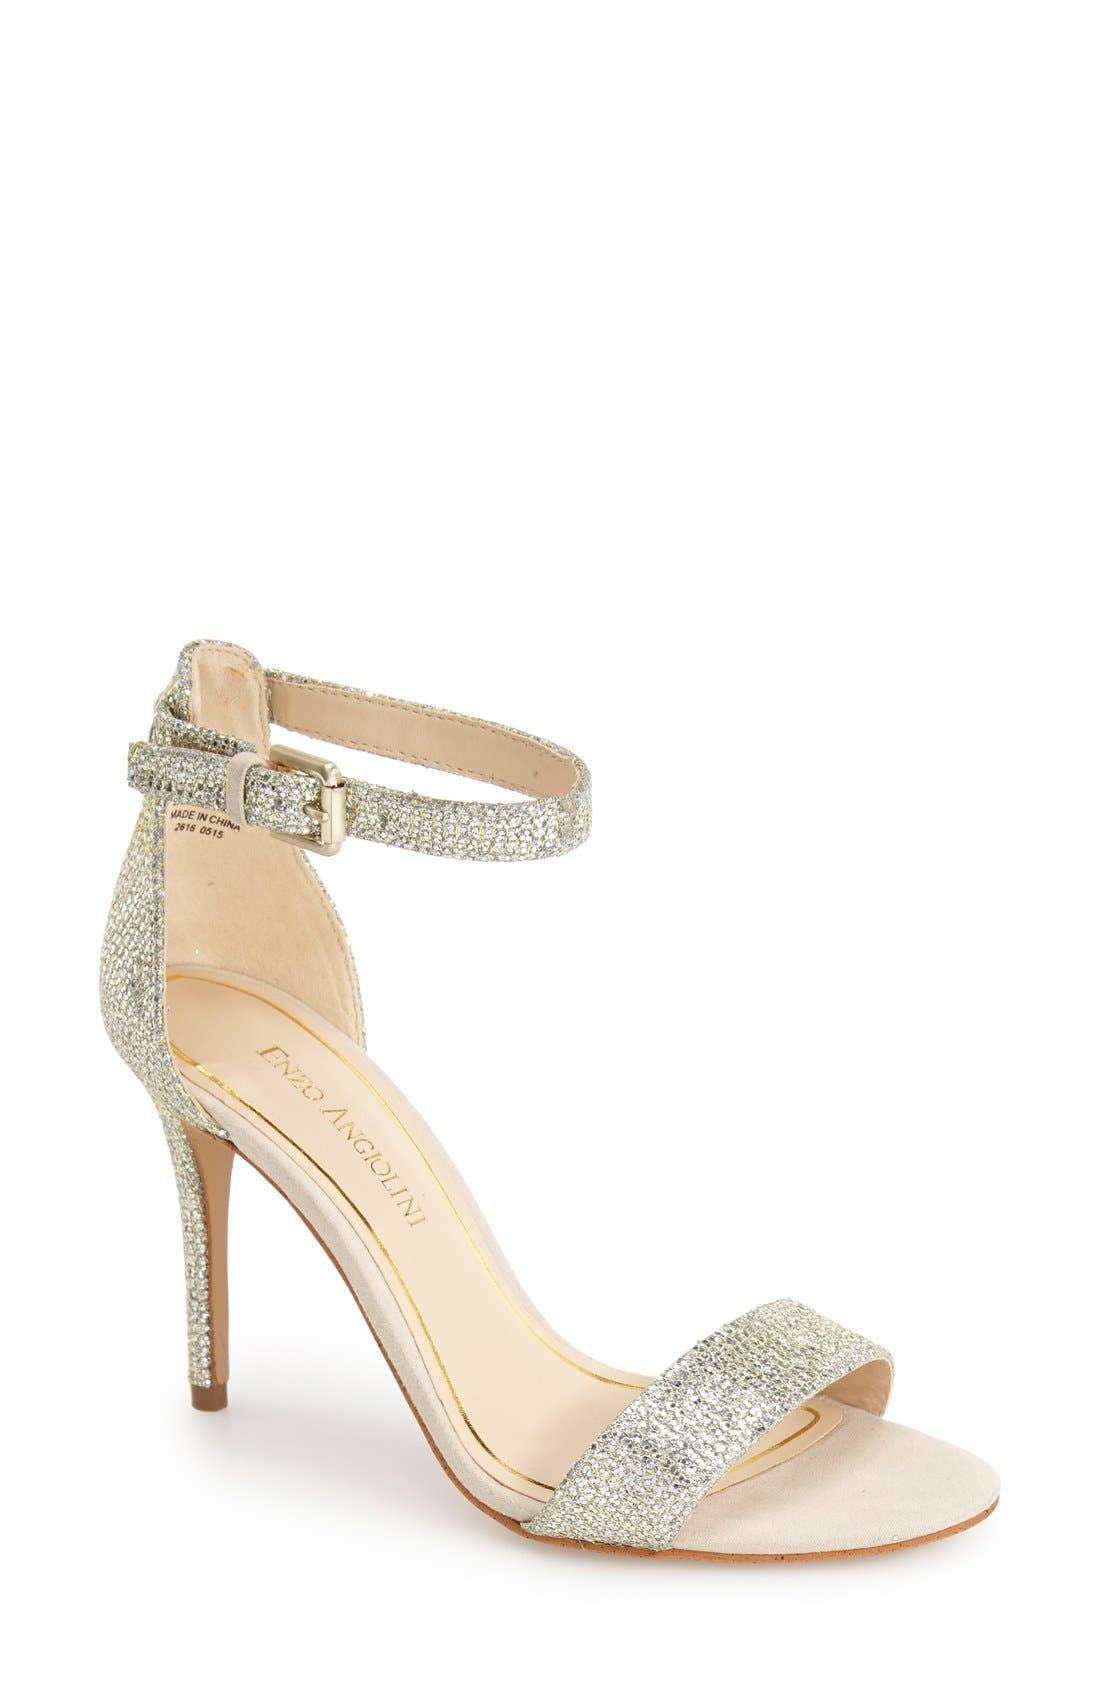 Main Image - Enzo Angiolini 'Manna' Ankle Strap Sandal (Women)